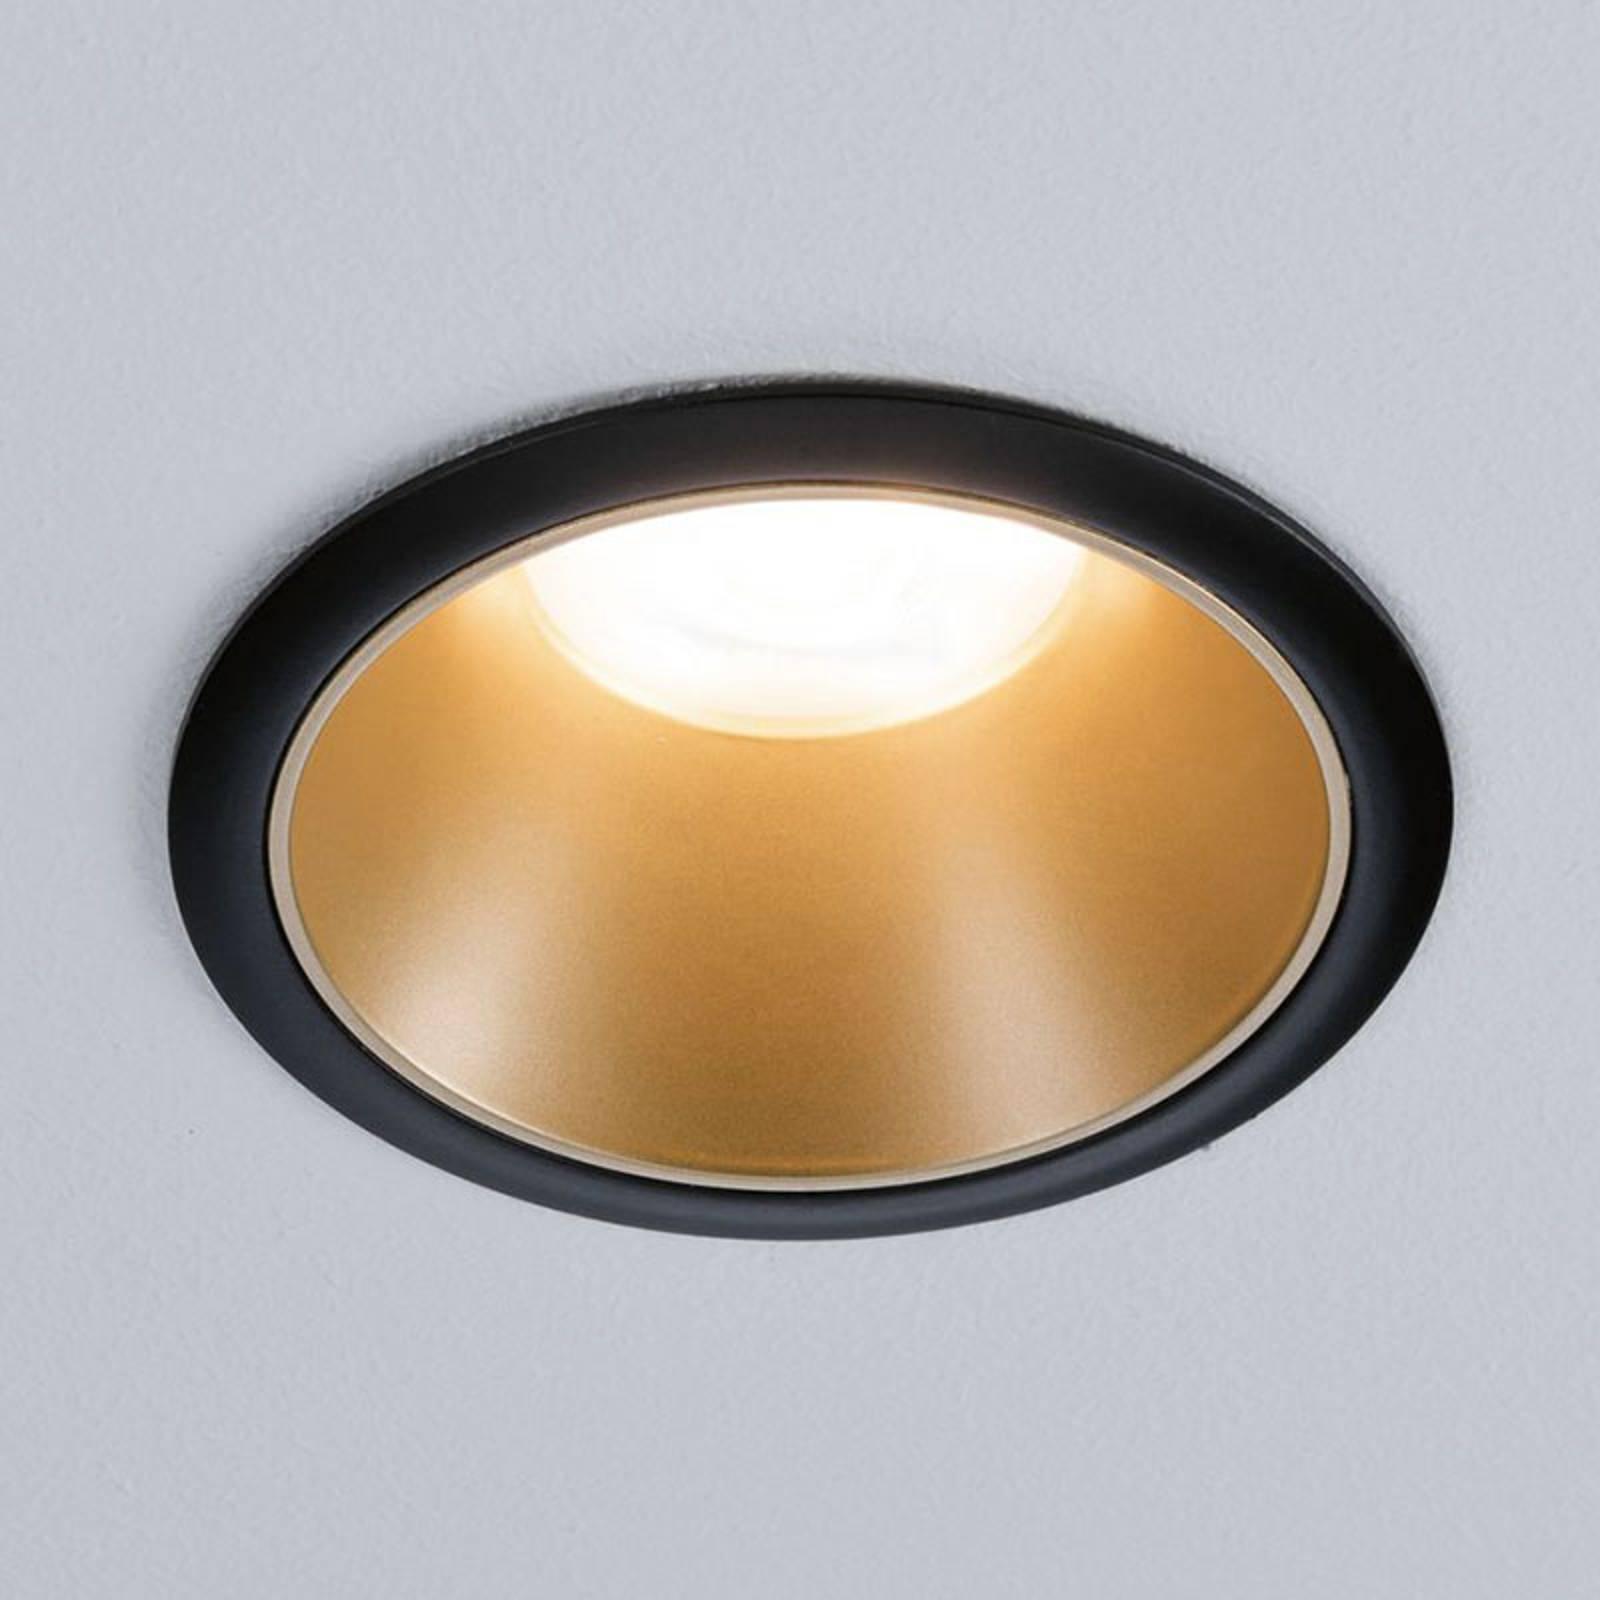 Paulmann Cole Spotlight GU10, musta/kulta